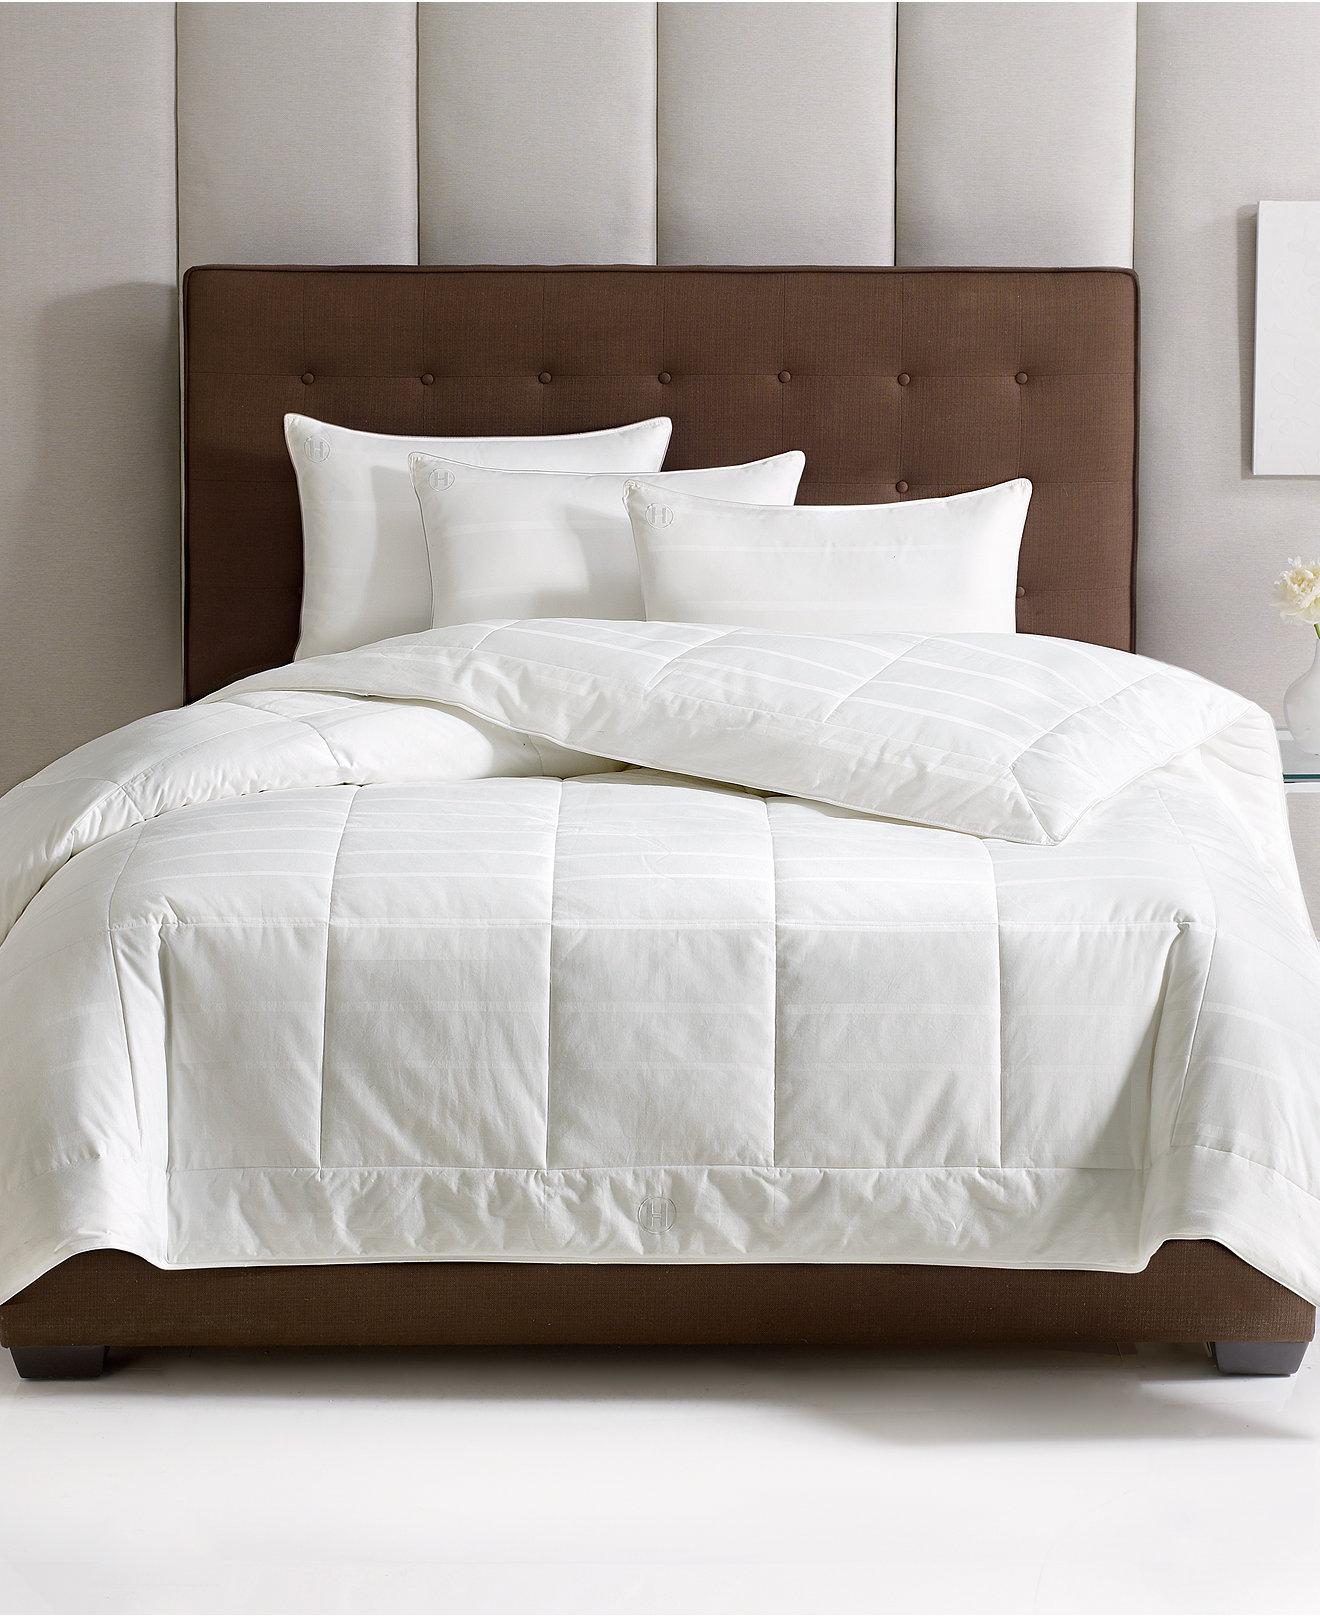 Home Design Alternative Color Comforters 28 Images Home Design Alternative Color Comforters